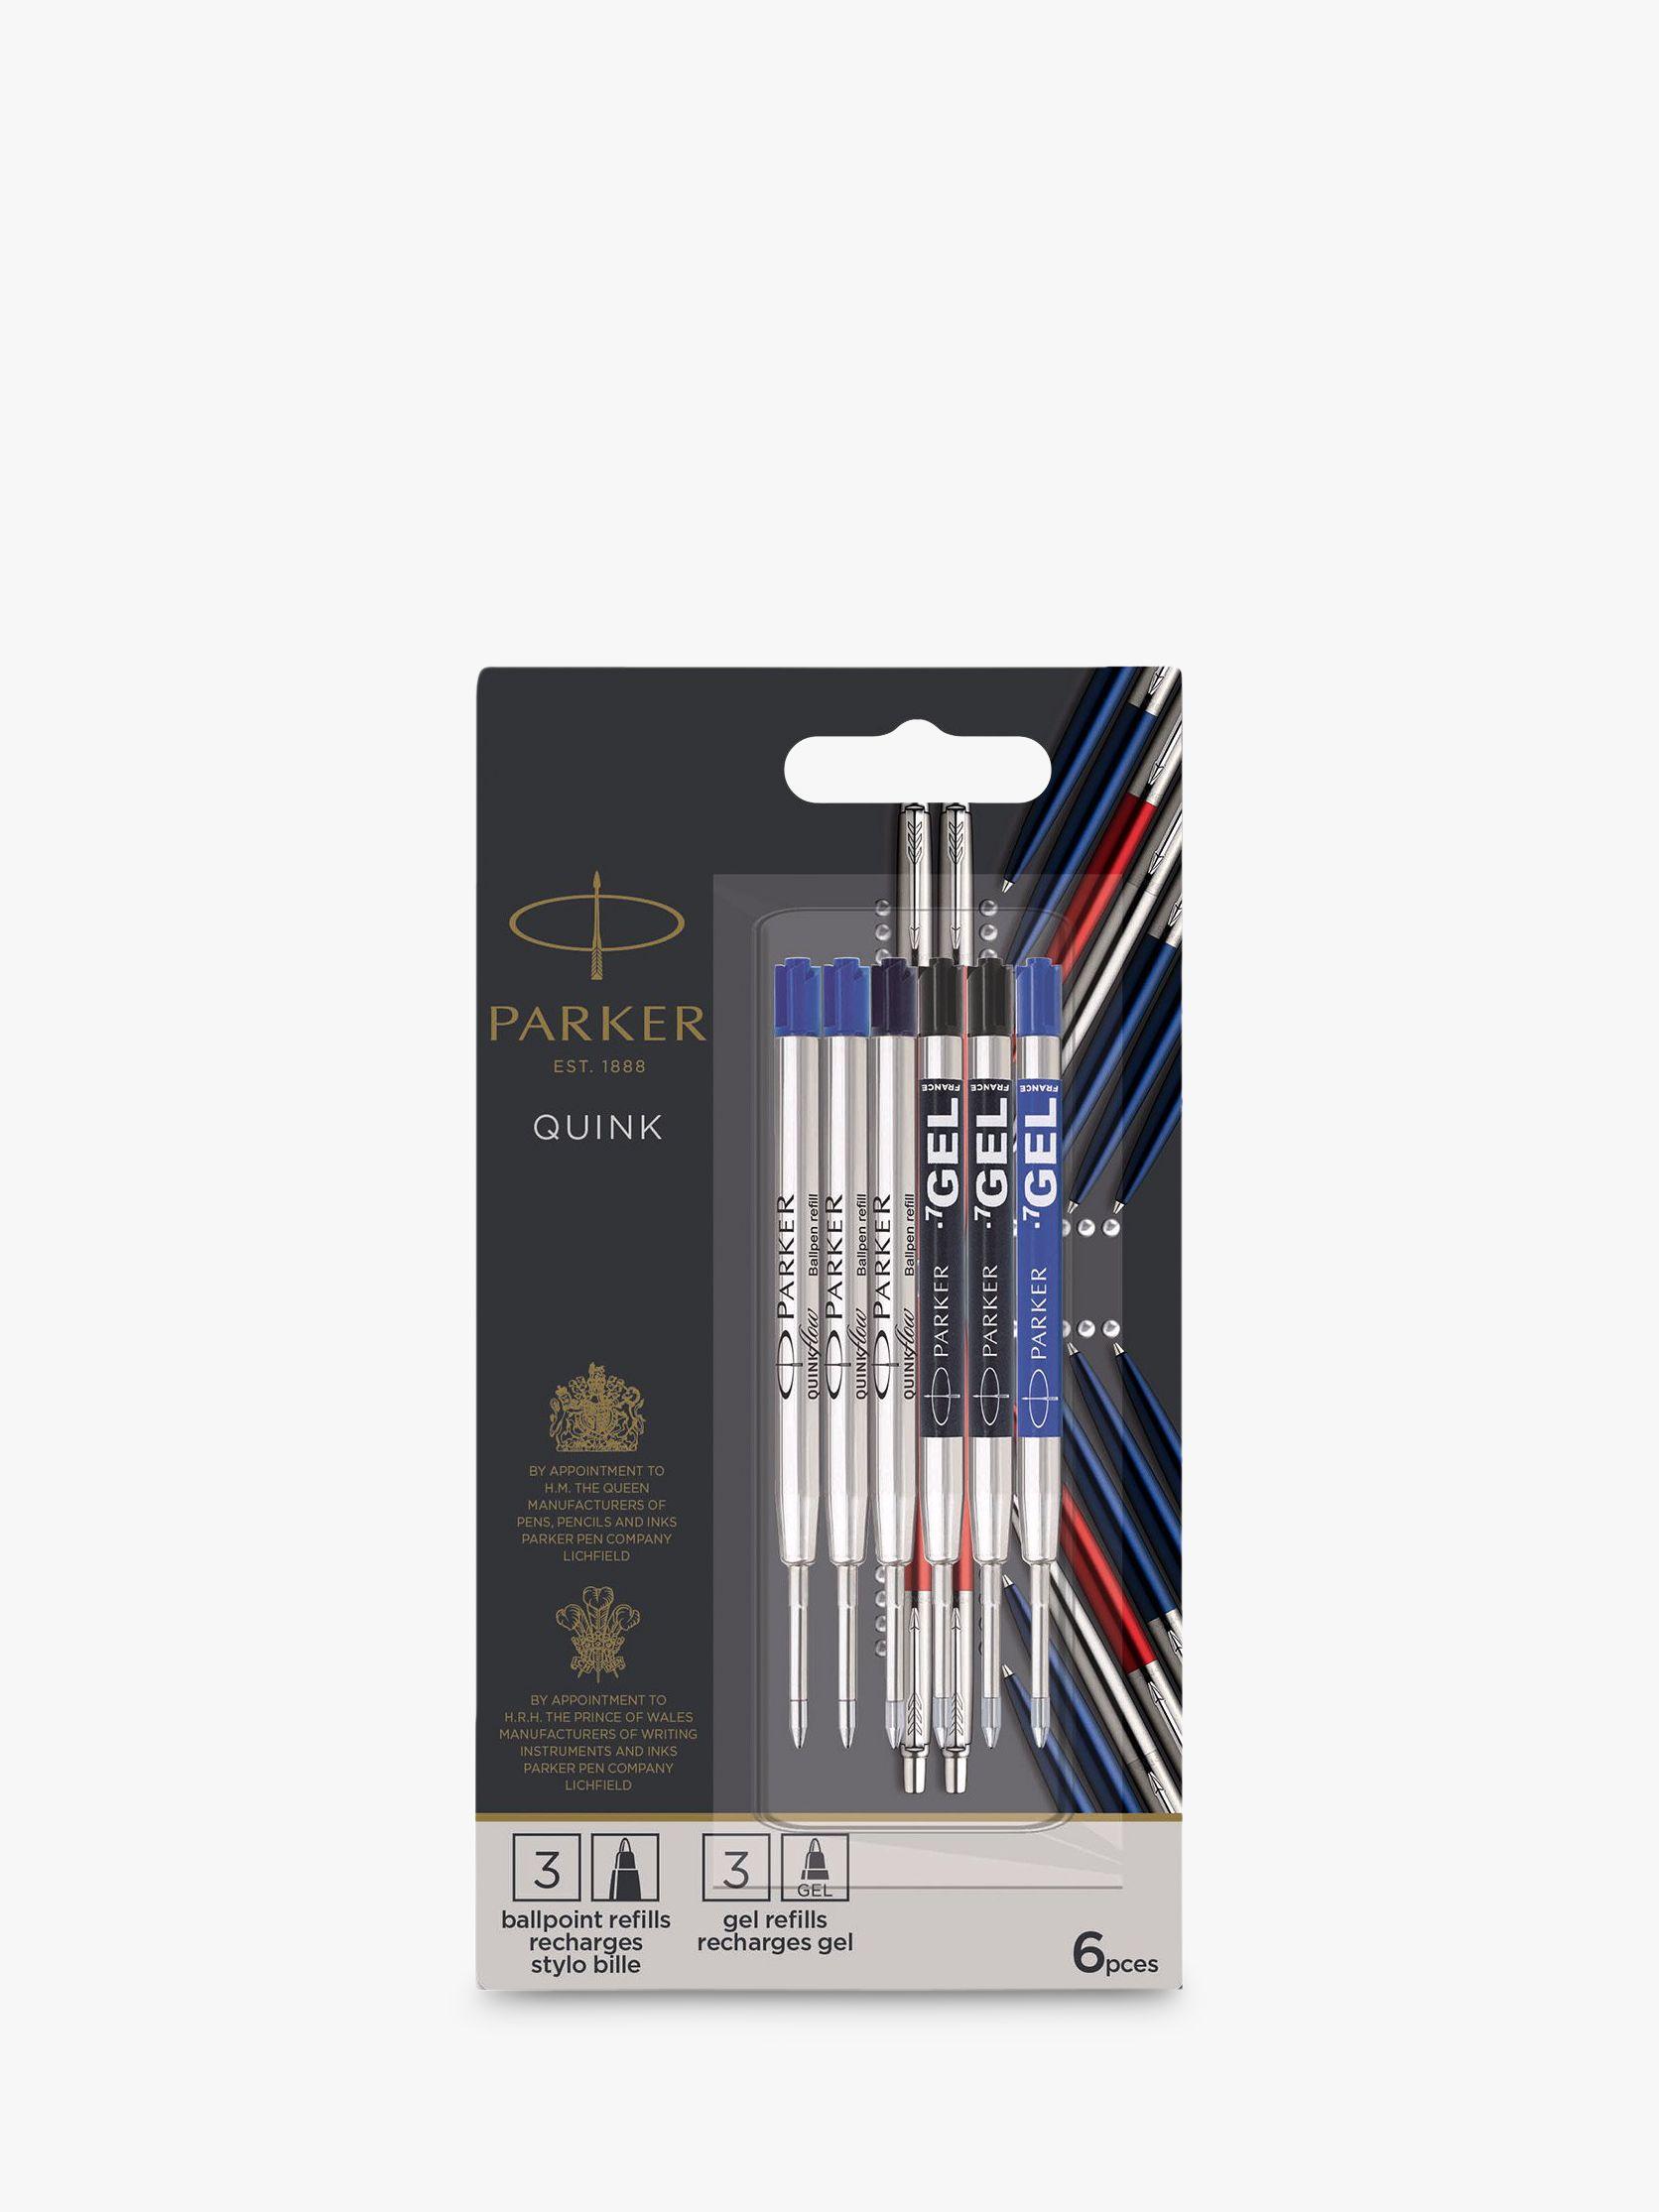 Parker PARKER Ballpoint Pen & Gel Pen Refills, Pack of 6